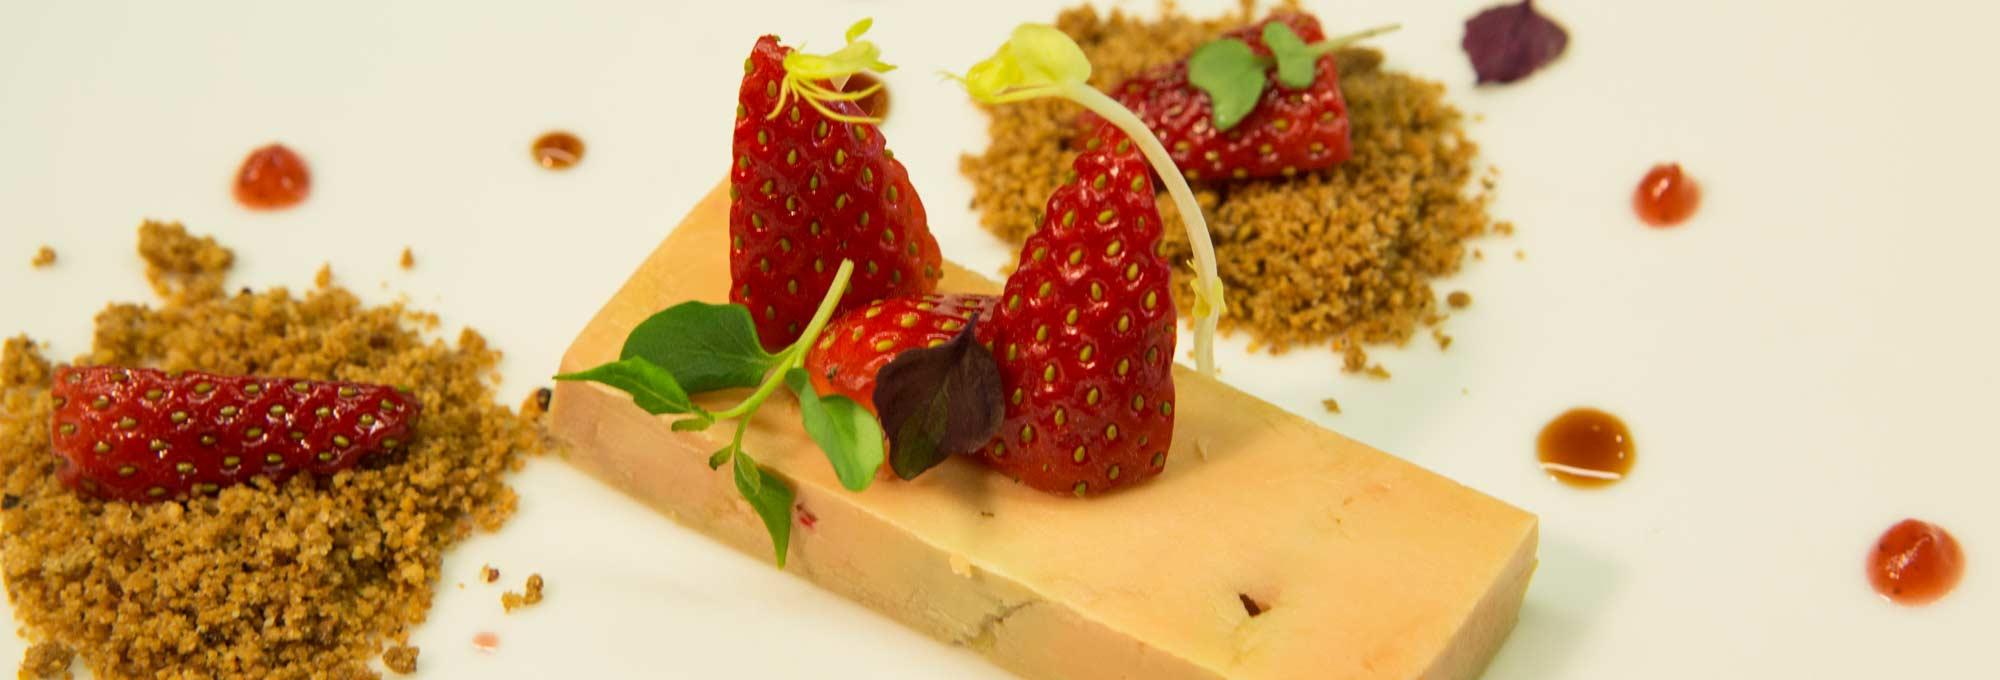 Restaurante-Villa-Retiro-menu-degustacion-estrella-Michelin-chef-Fran-Lopez